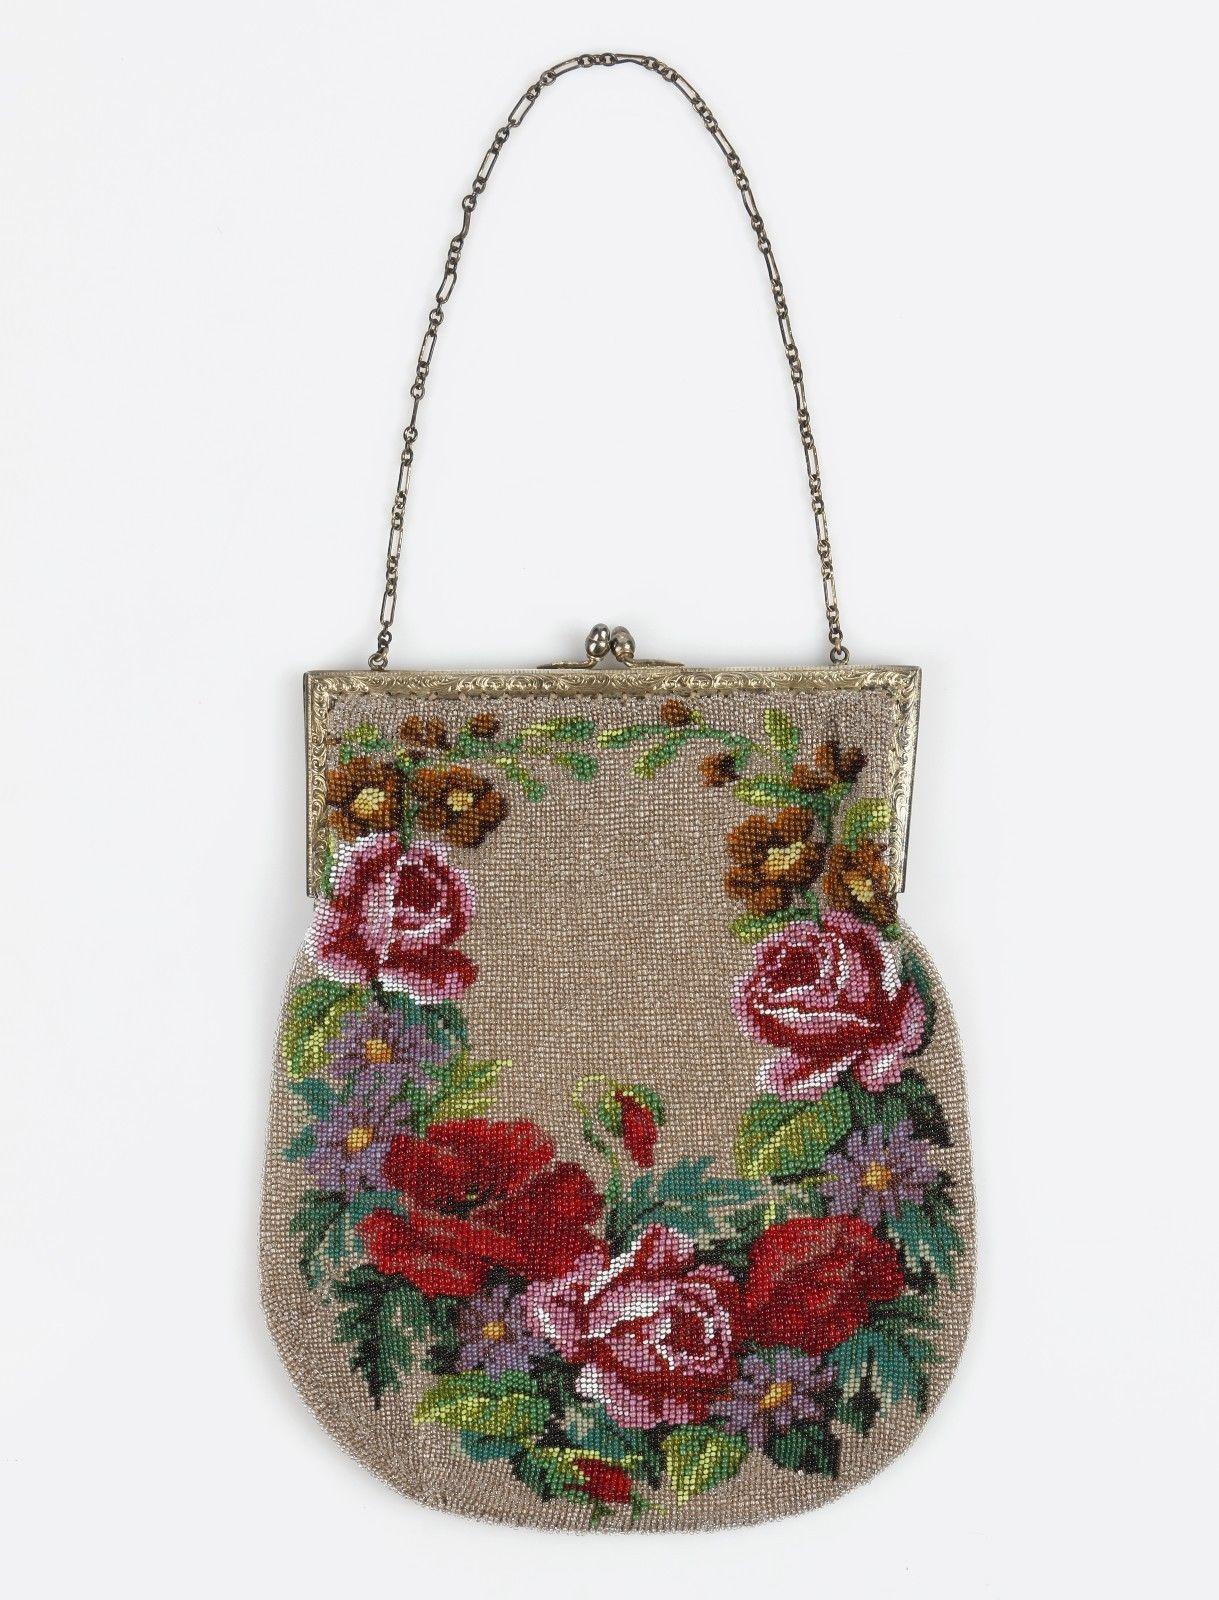 Vtg 1910s 1920s Multi Color Fl Micro Beaded Large Evening Bag Purse Ebay